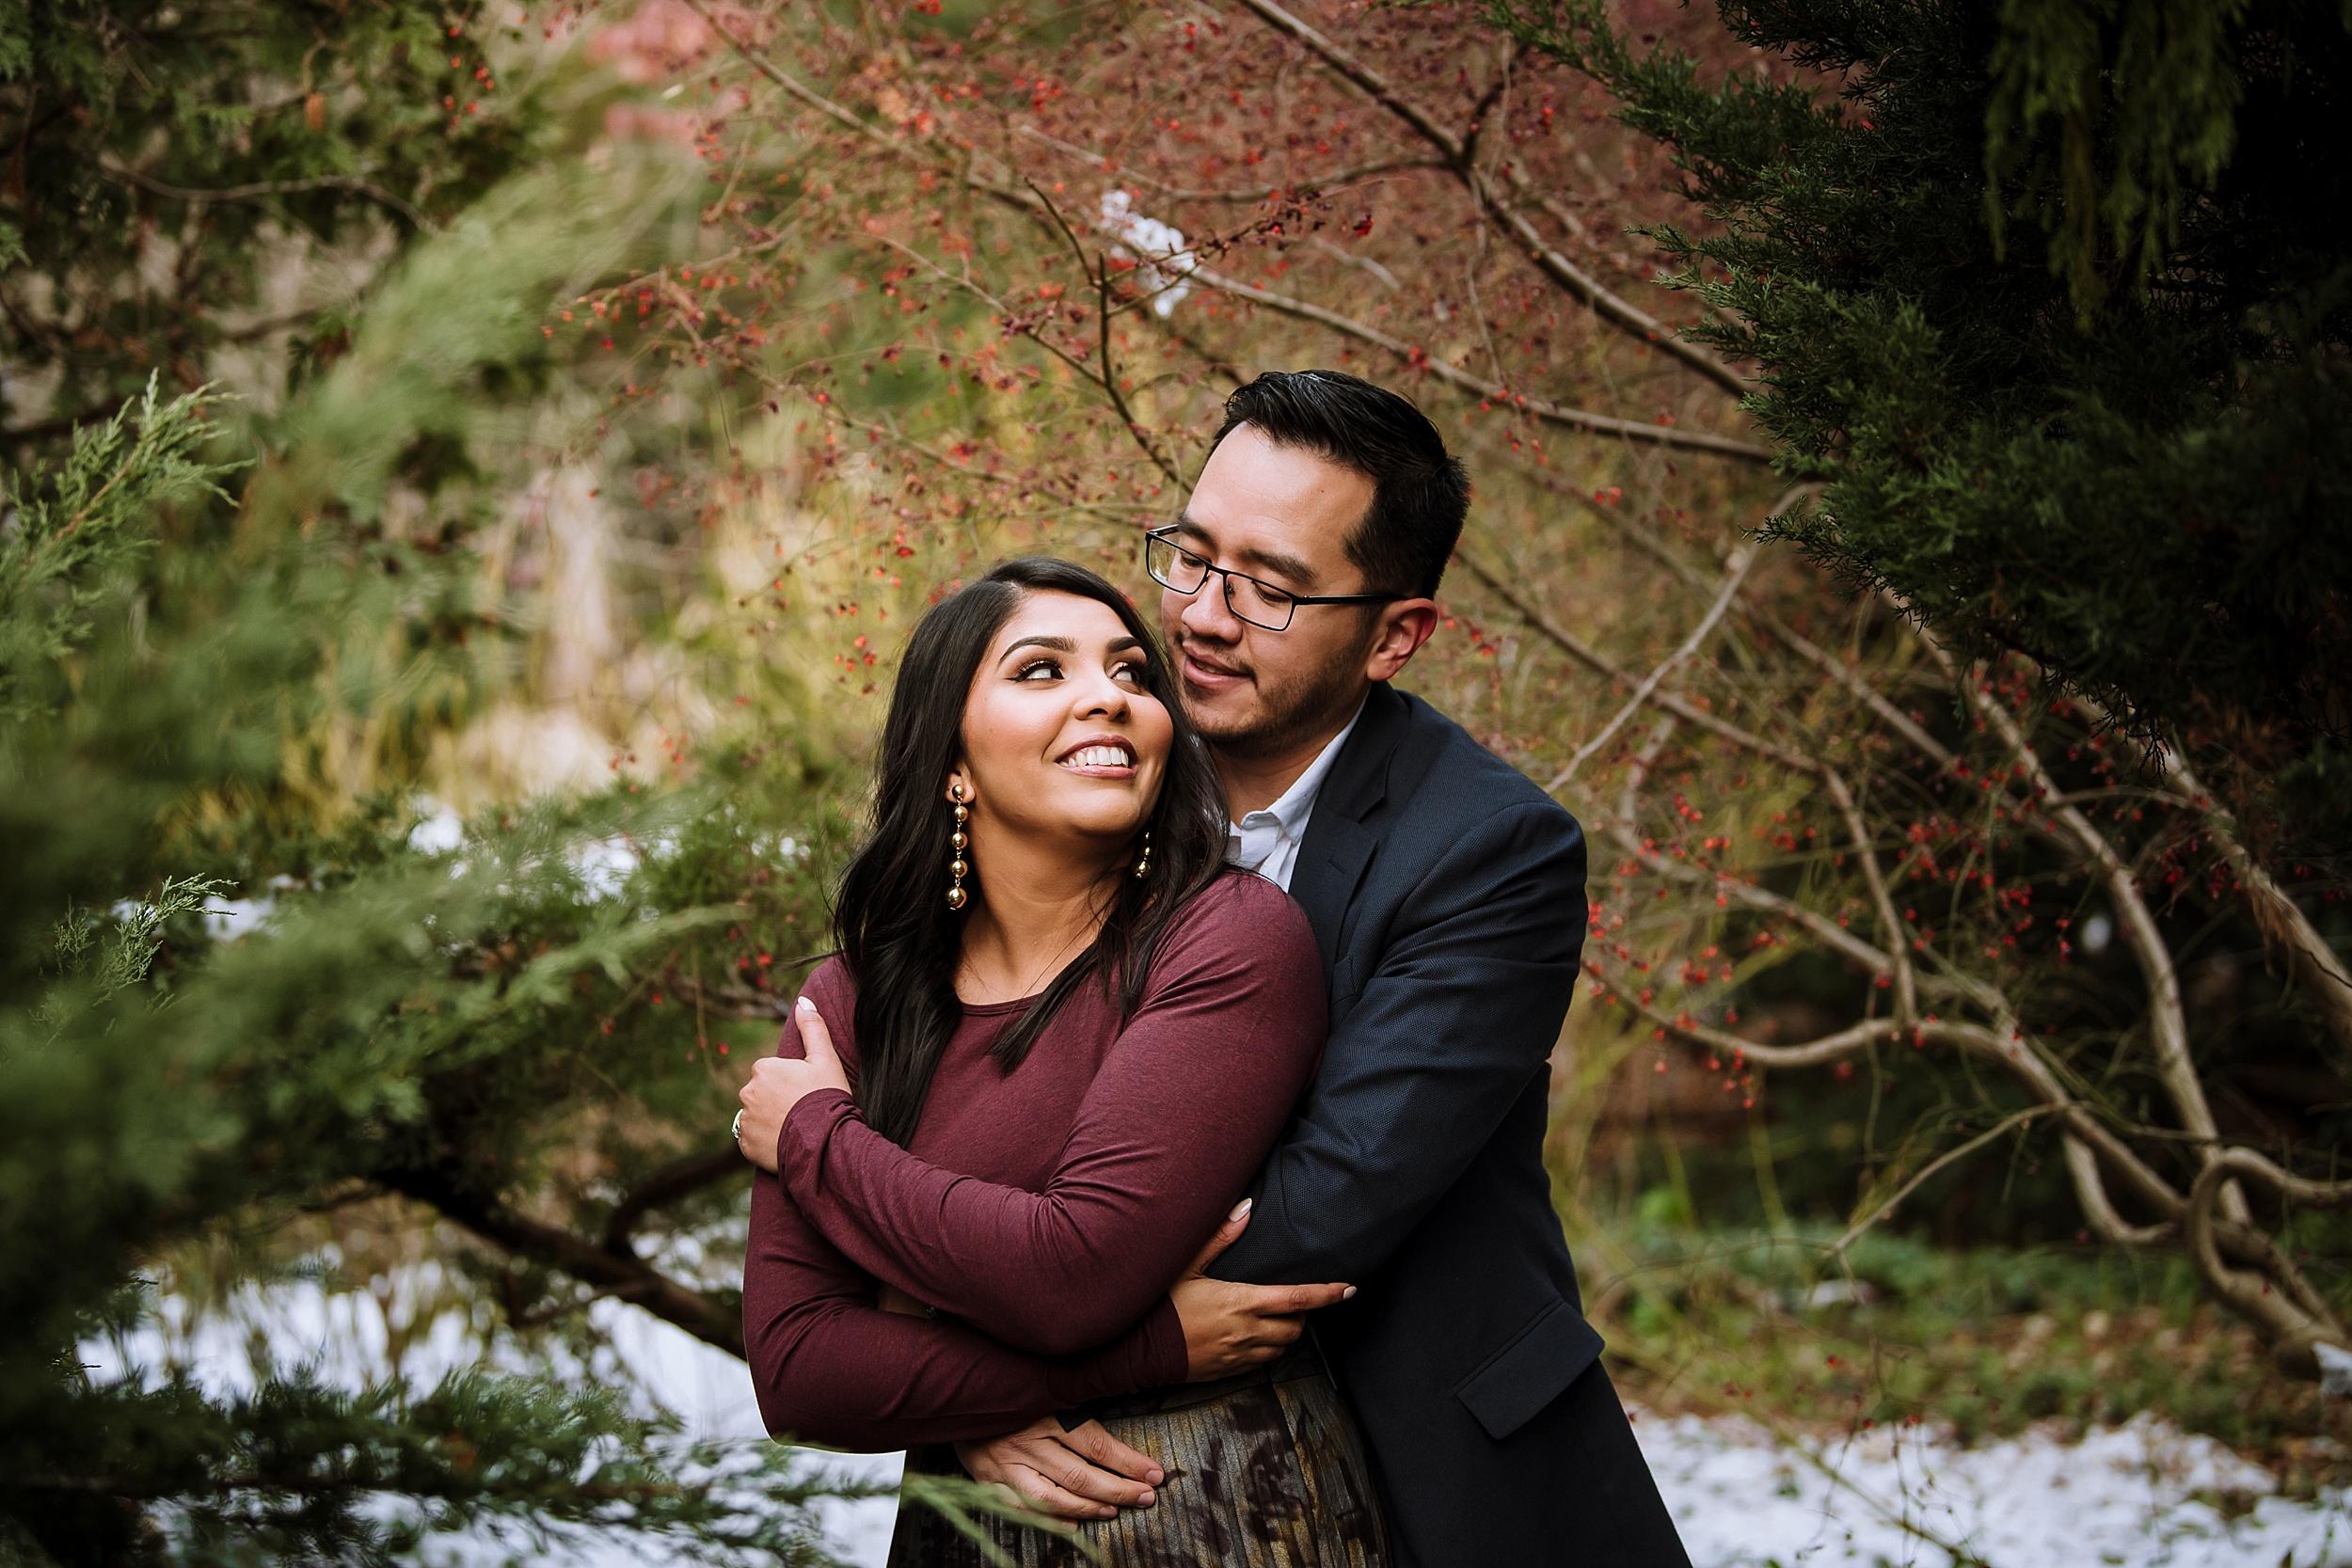 Alexander_Muir_Memorial_Gardens_Engagement_Shoot_Toronto_Wedding_Photographer_0011.jpg